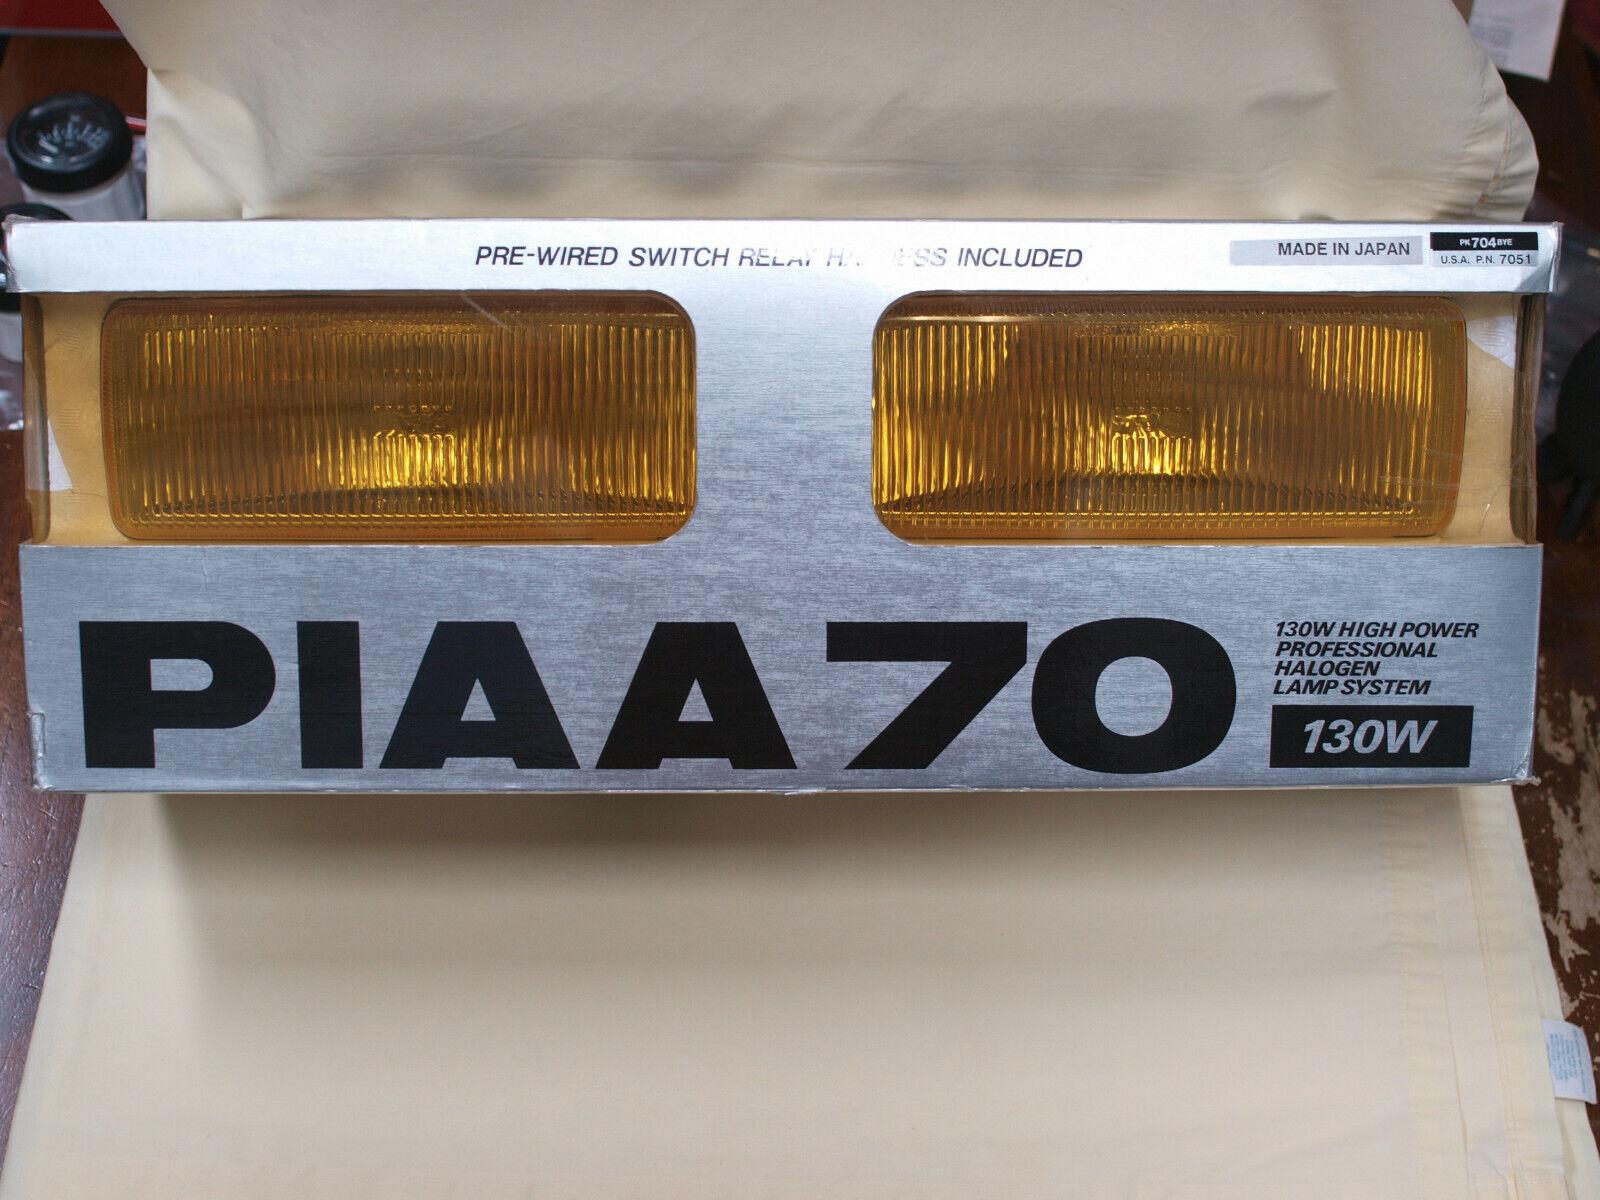 PIAA 70 Series 130W Ion Crystal Lamp Kit - NOS